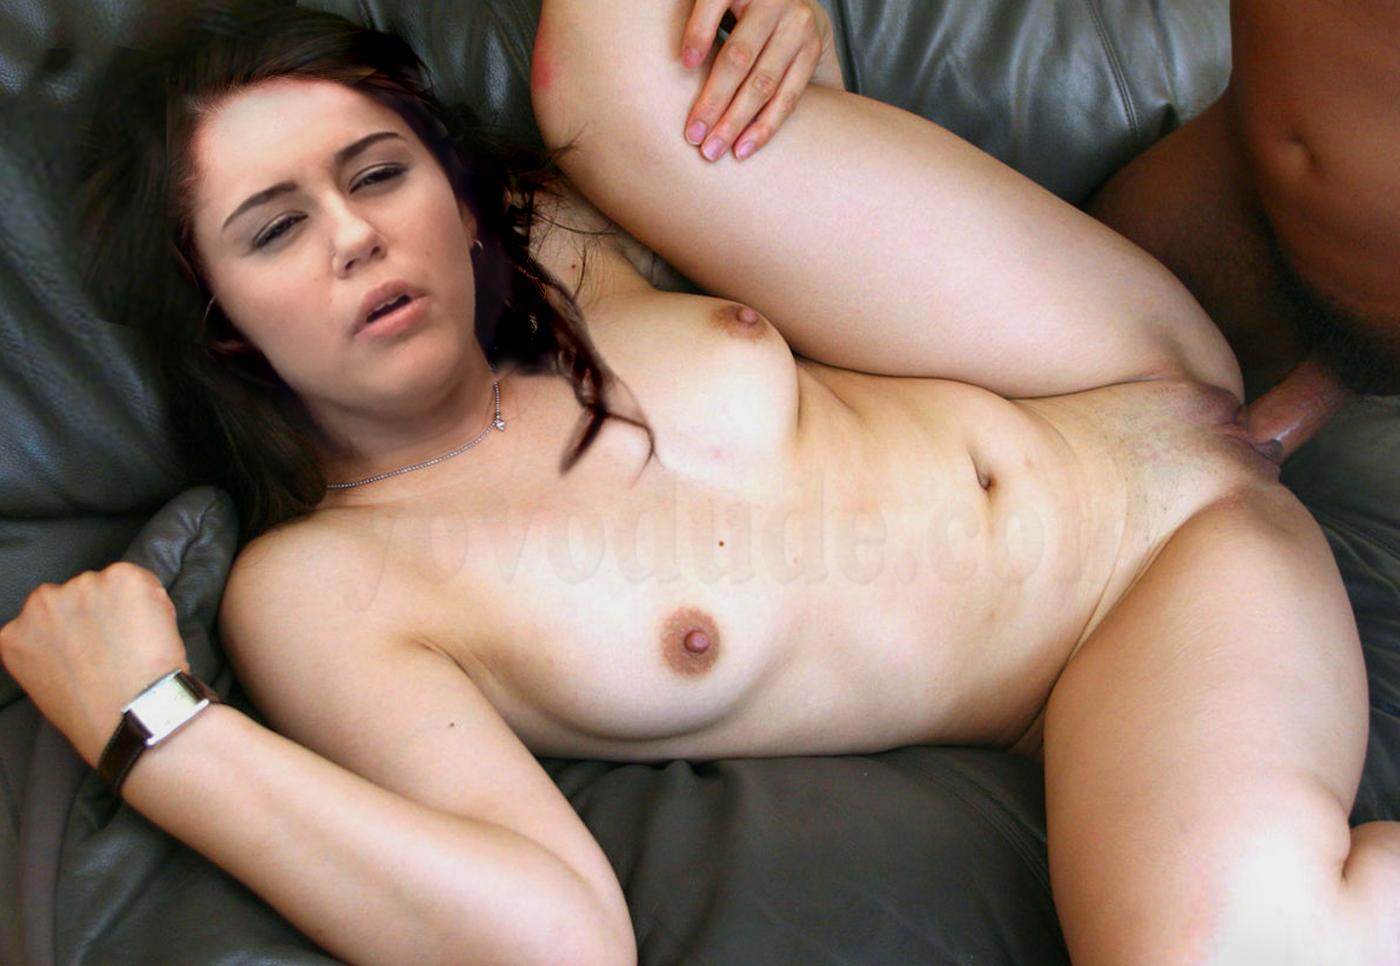 Miley Cyrus Emily Osmeny Hot Sex Videos